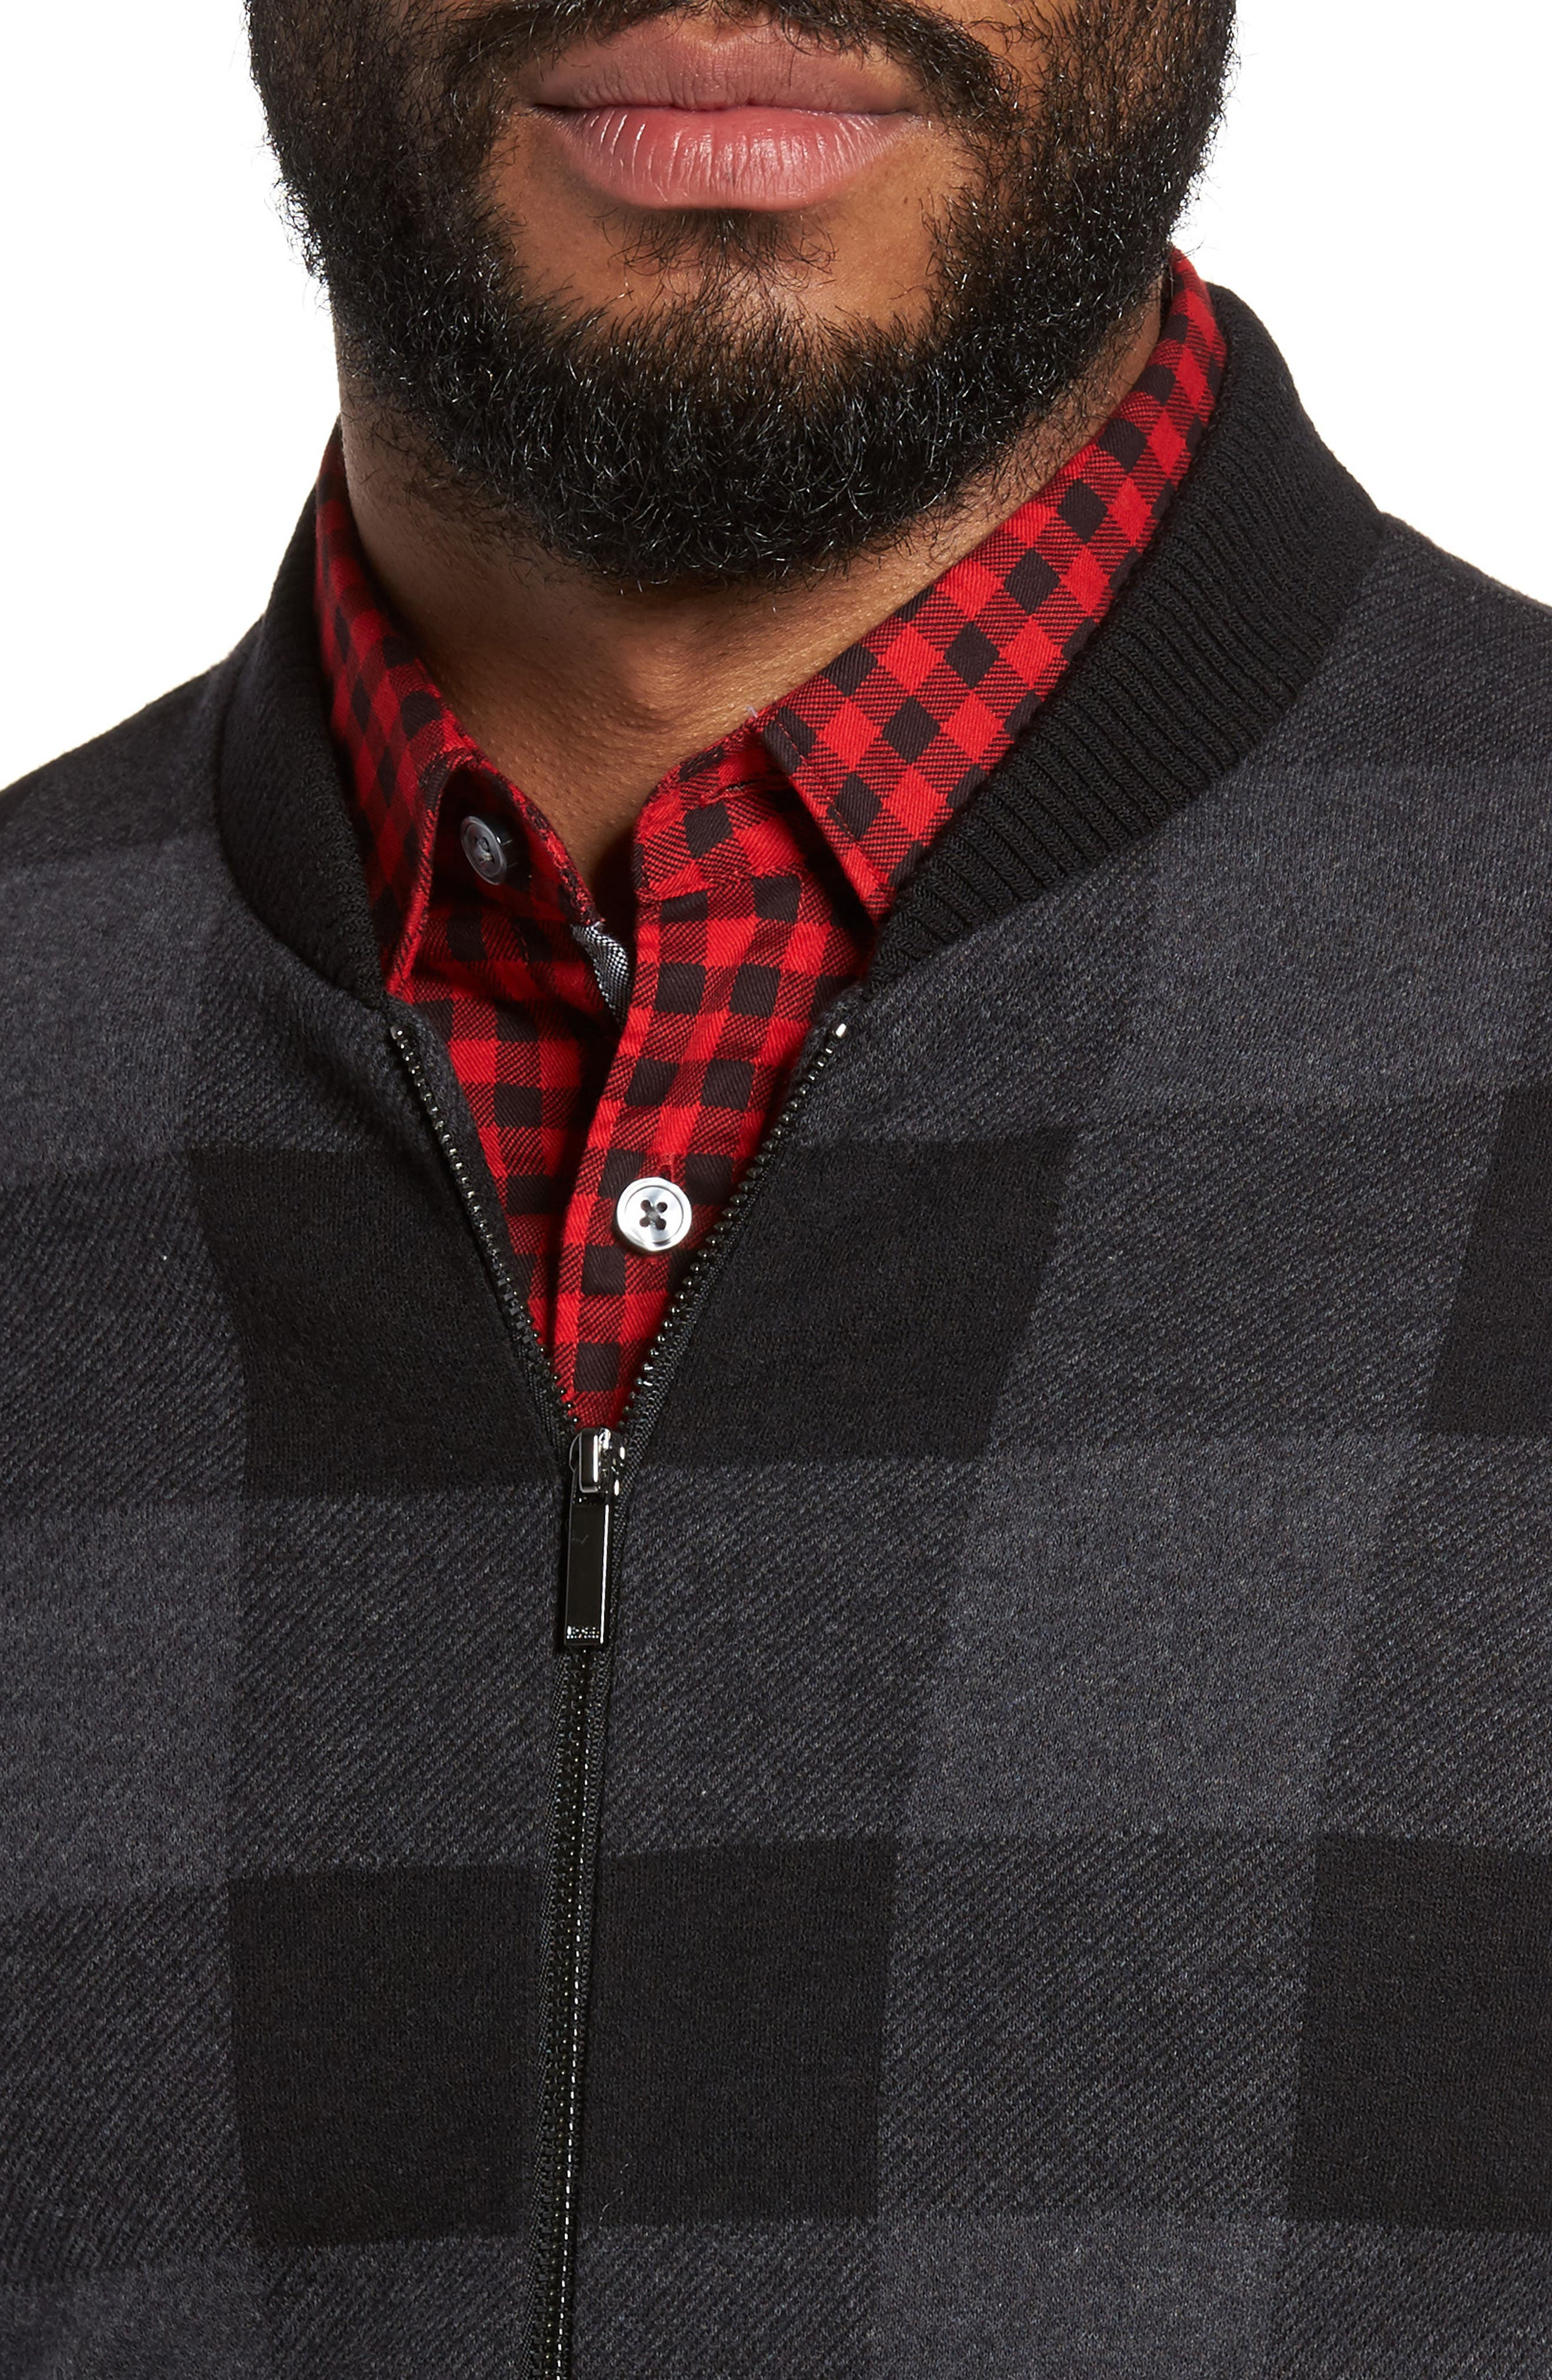 Salea Check Wool Blend Bomber Jacket,                             Alternate thumbnail 4, color,                             001